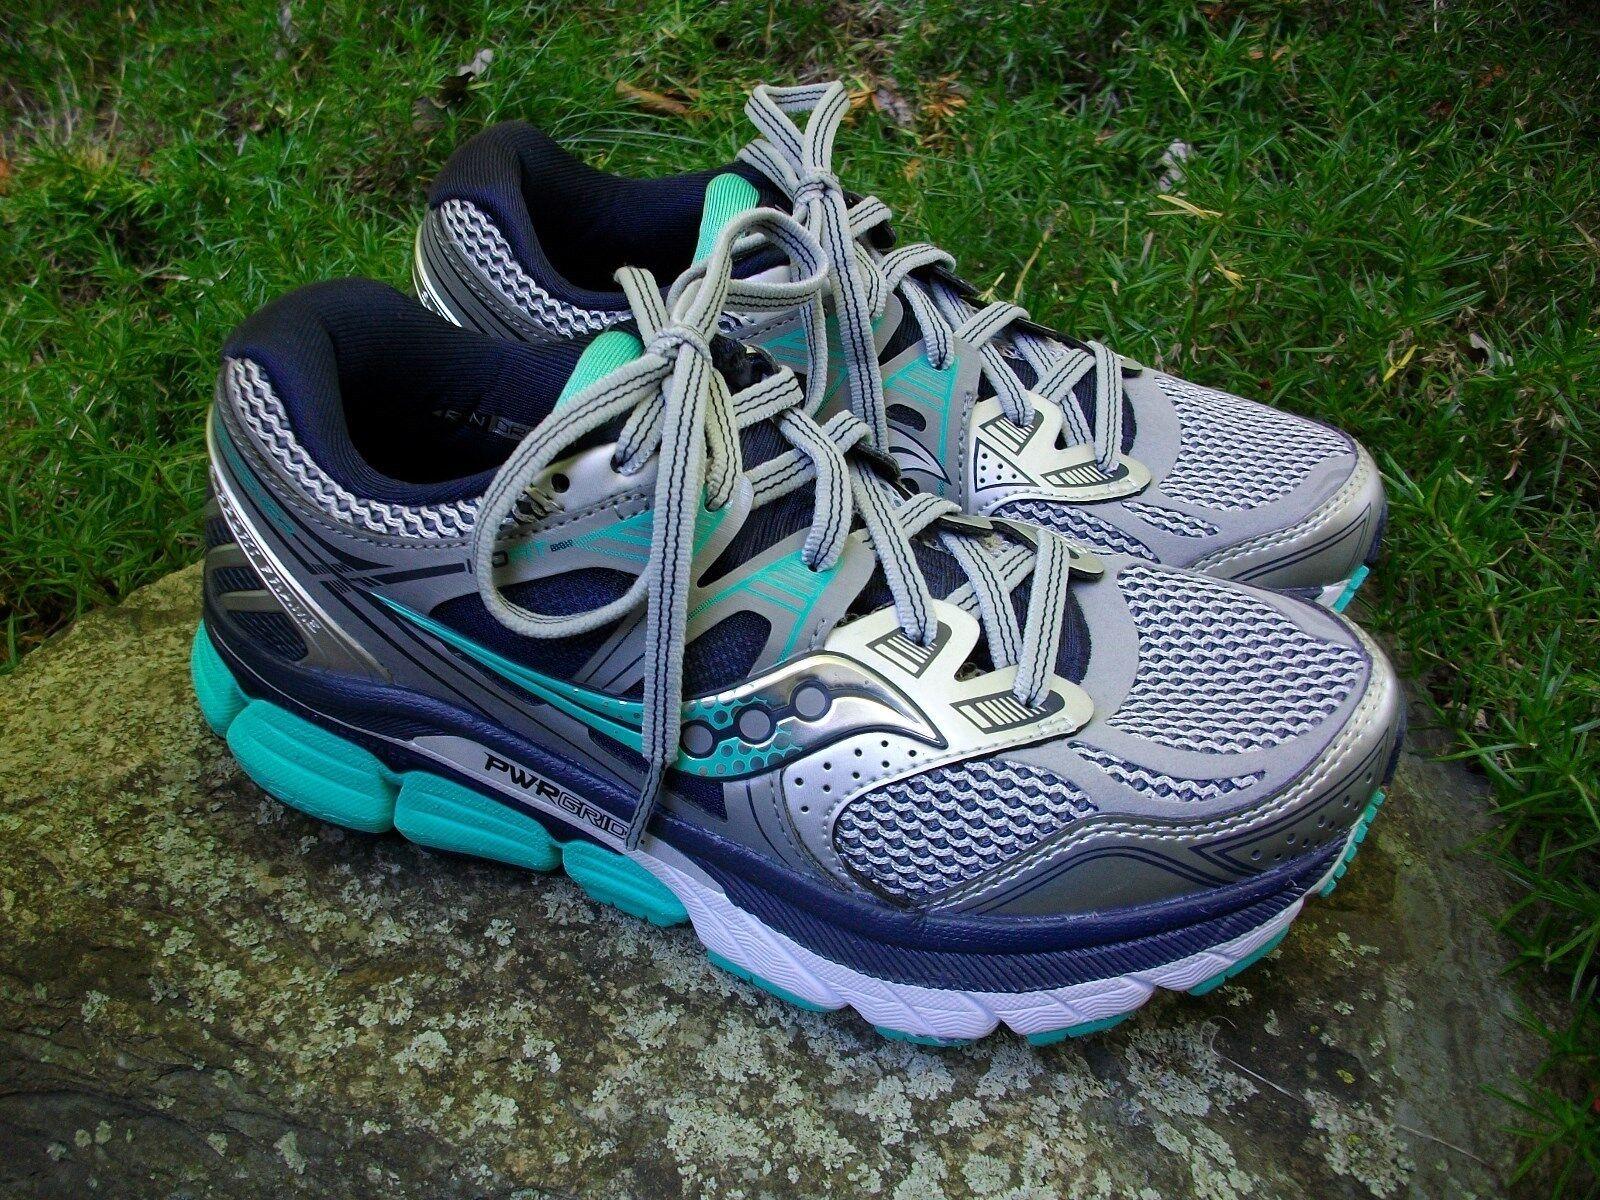 New Women's Saucony Redeemer ISO Running shoes shoes shoes Silver Green bluee Size 5M EU 35.5 779bfa